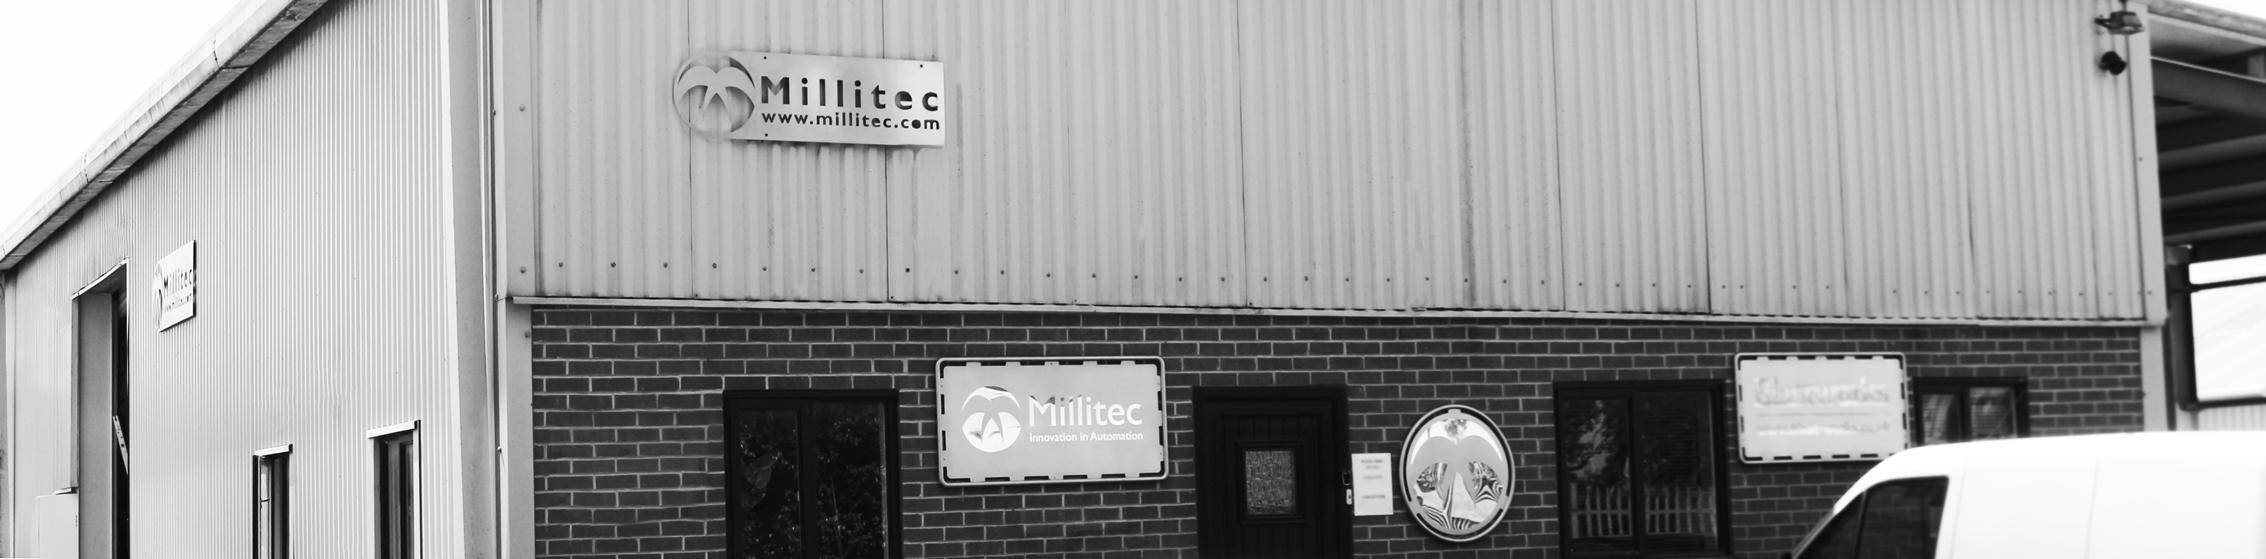 millitec-building-old